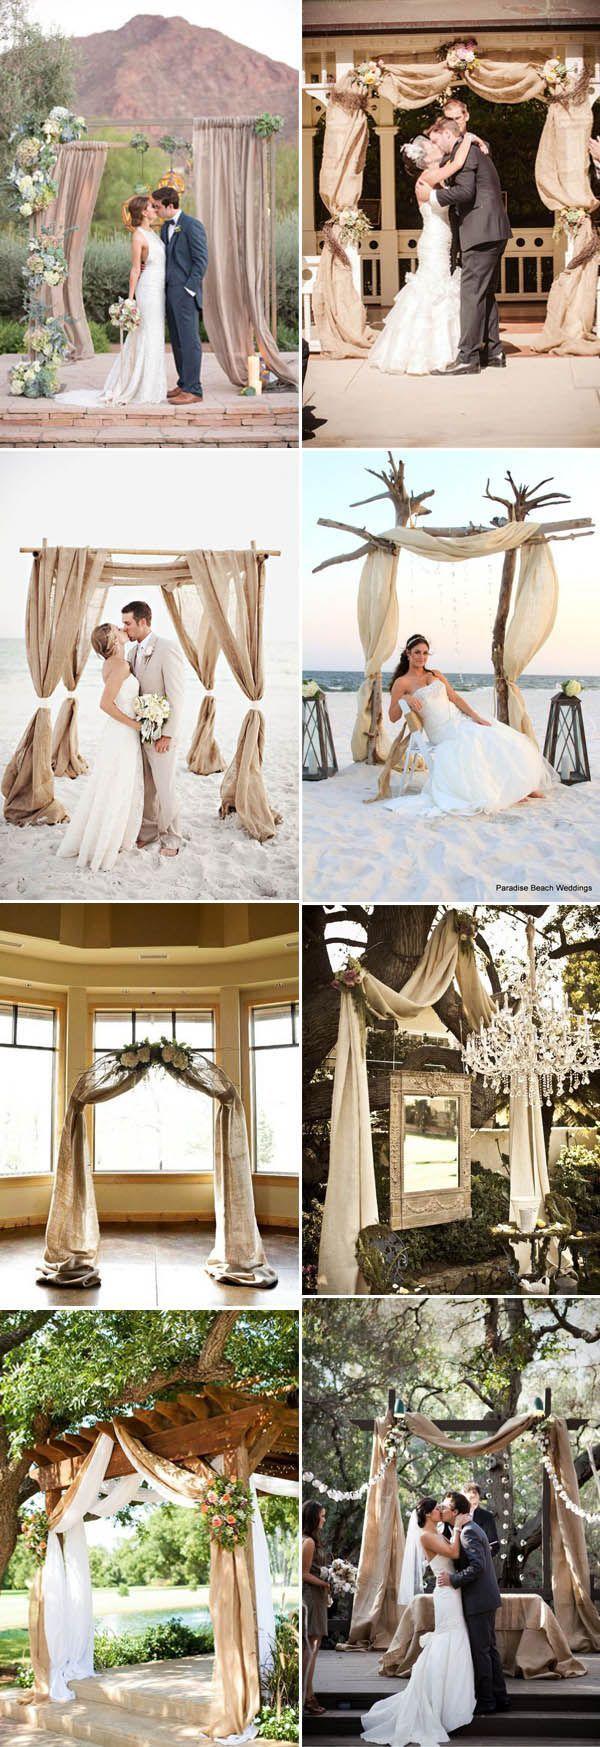 rustic burlap wedding altar ideas for ceremony